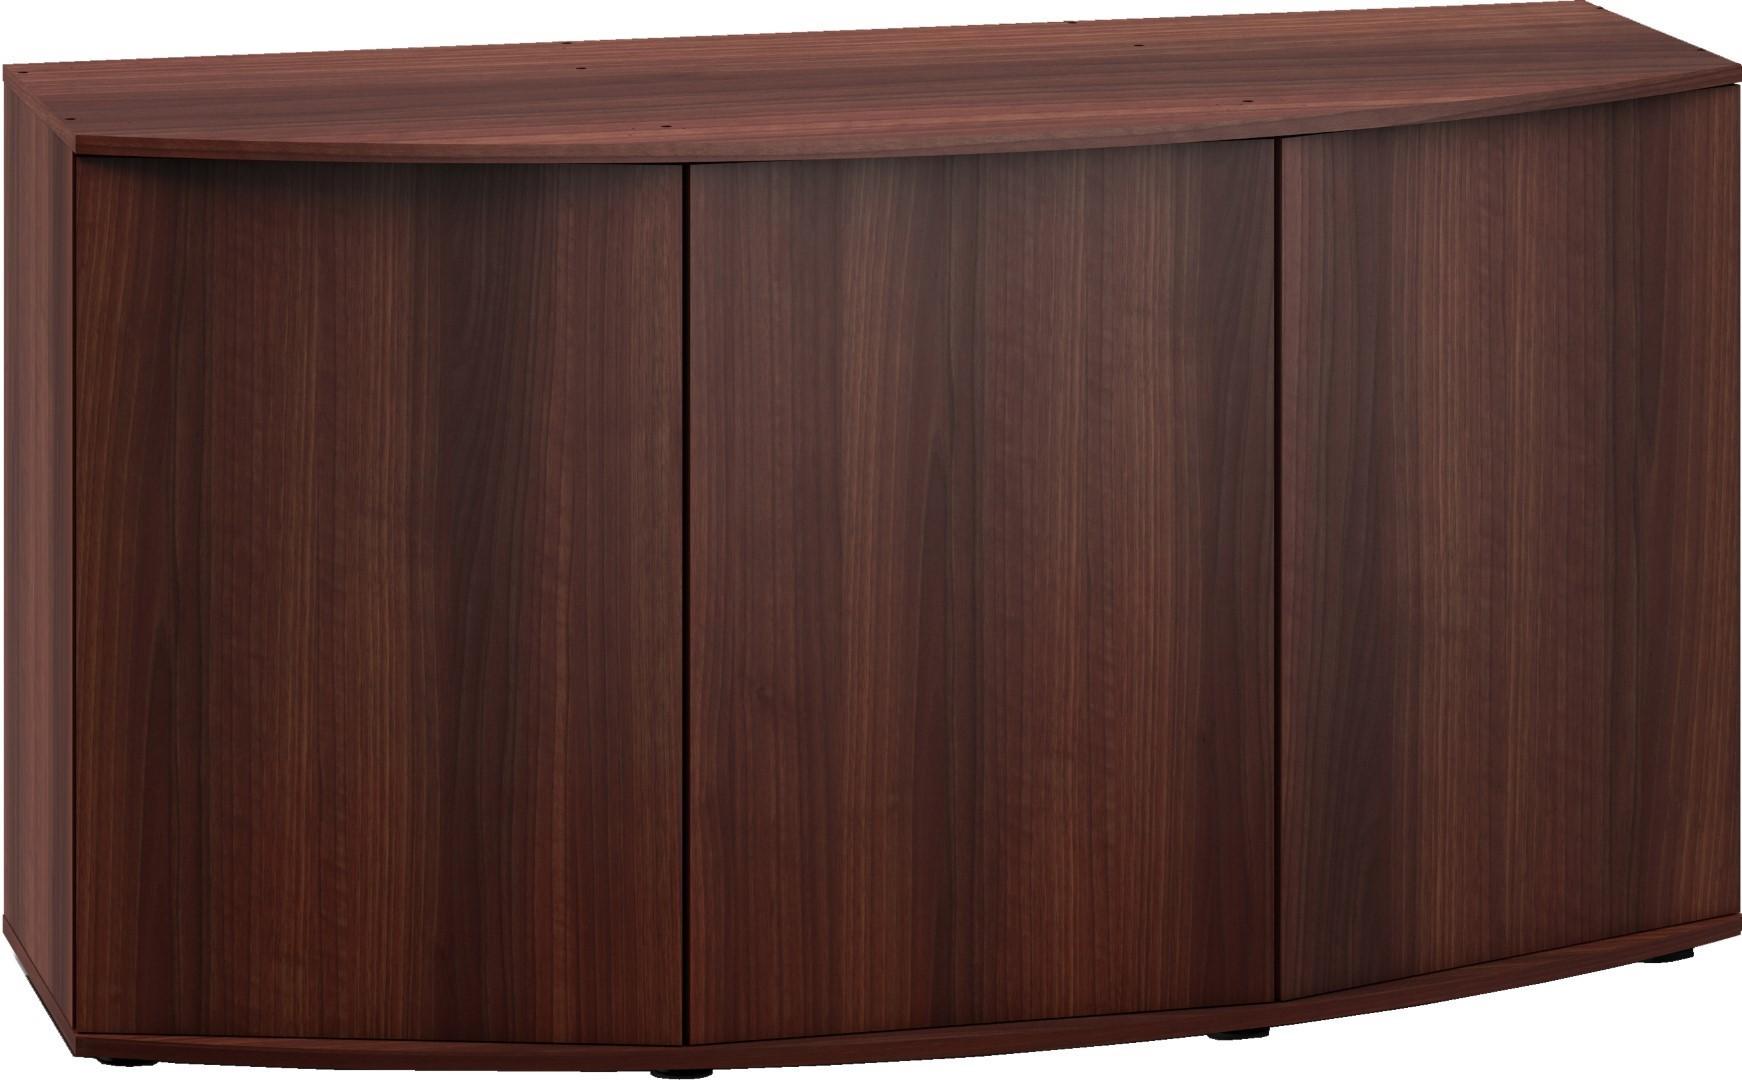 Juwel meubel bouwpakket SBX Vision 450 donkerbruin